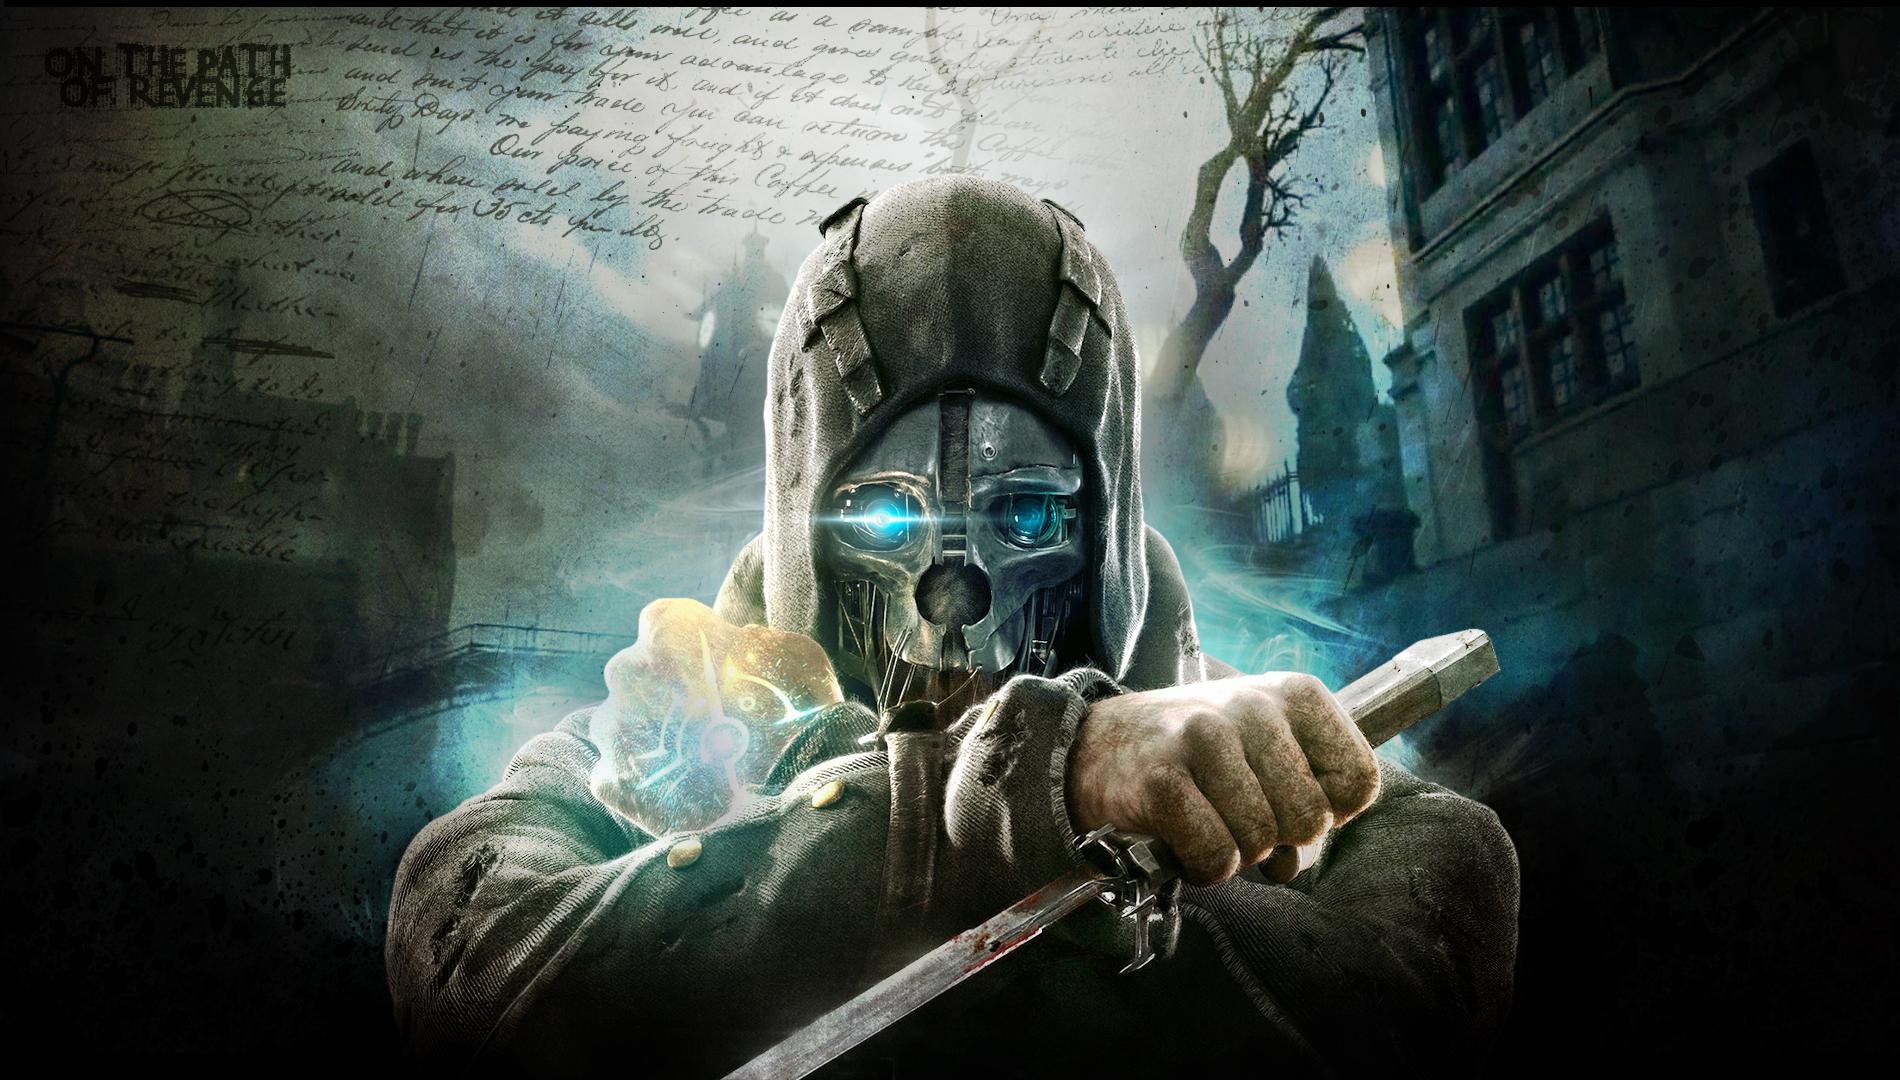 Corvo Attano dishonored Fan Art Assasins of all kind Corvo